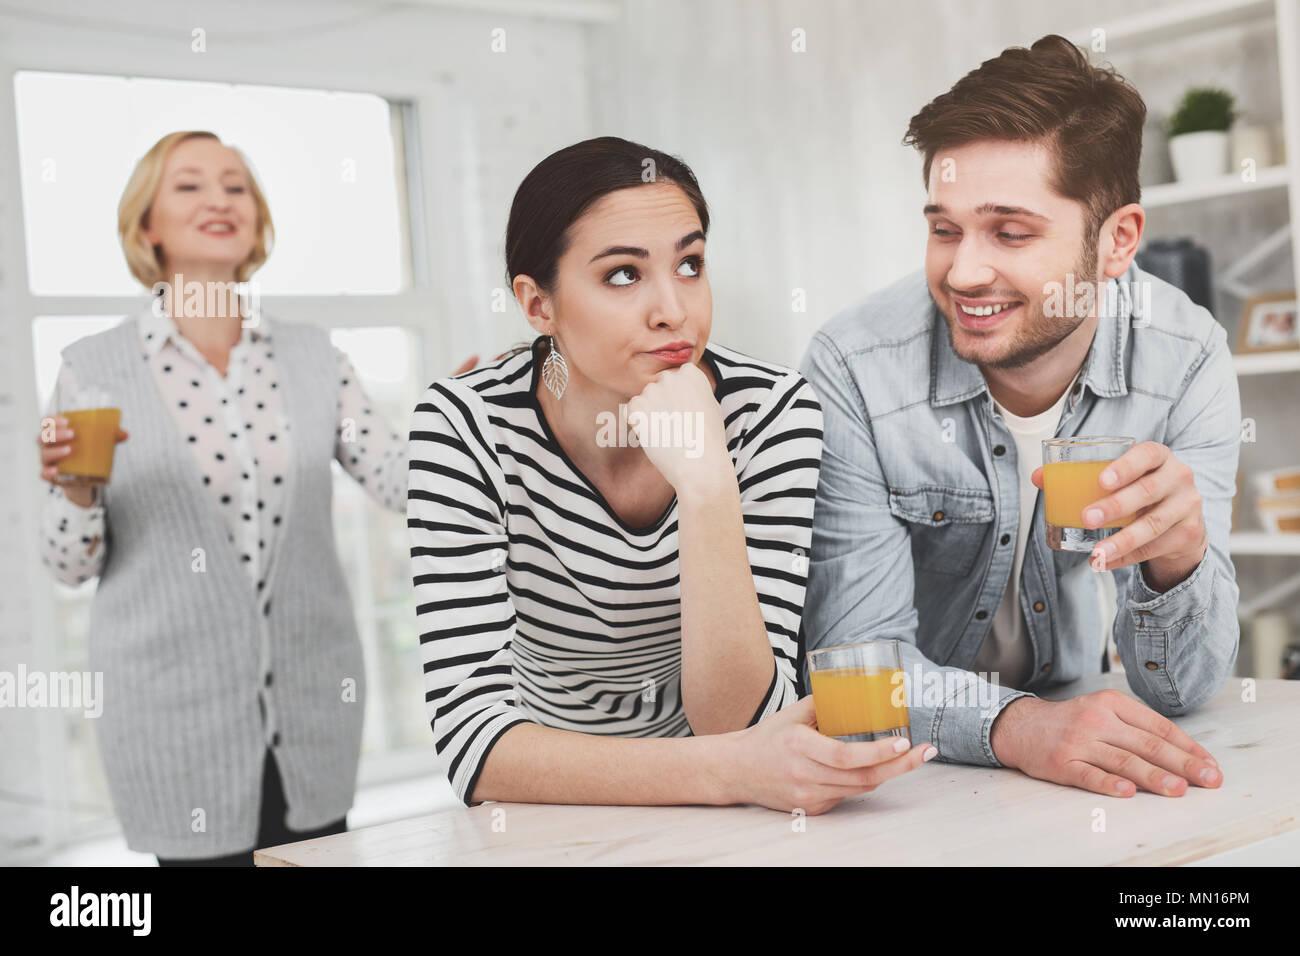 Linda pareja joven viviendo junto con la madre Imagen De Stock